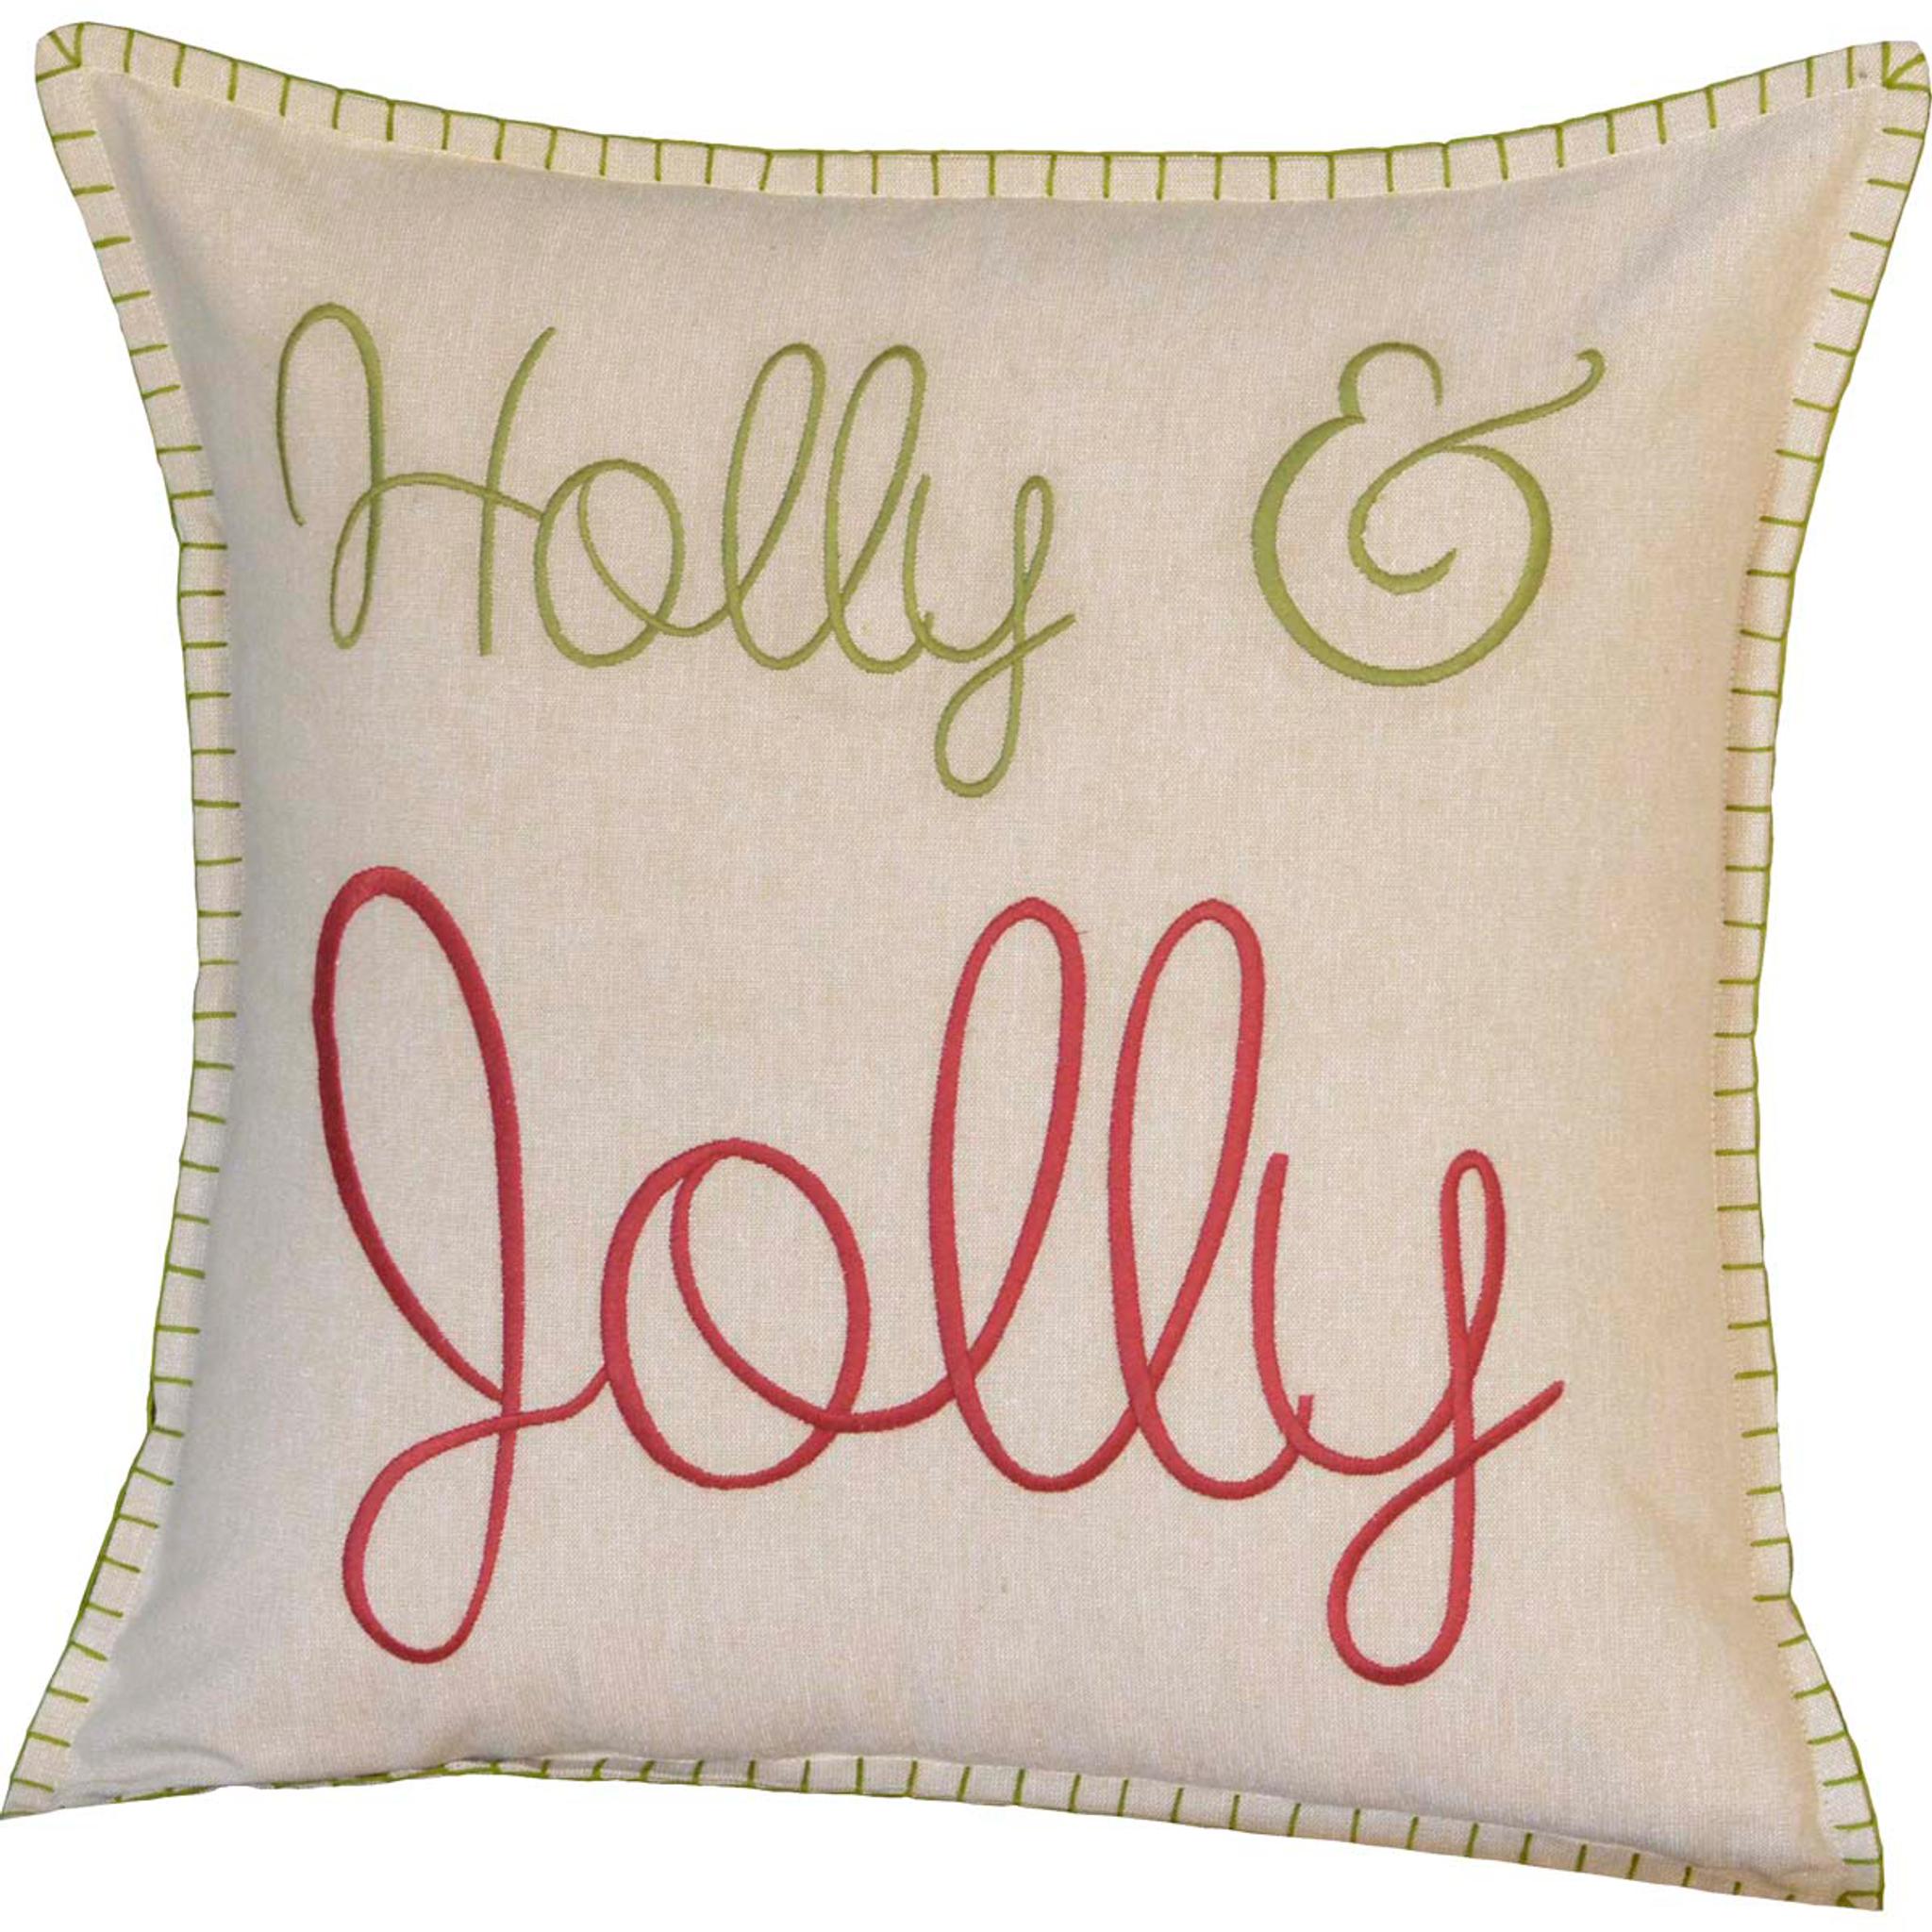 Holly Jolly Christmas Toss Pillow